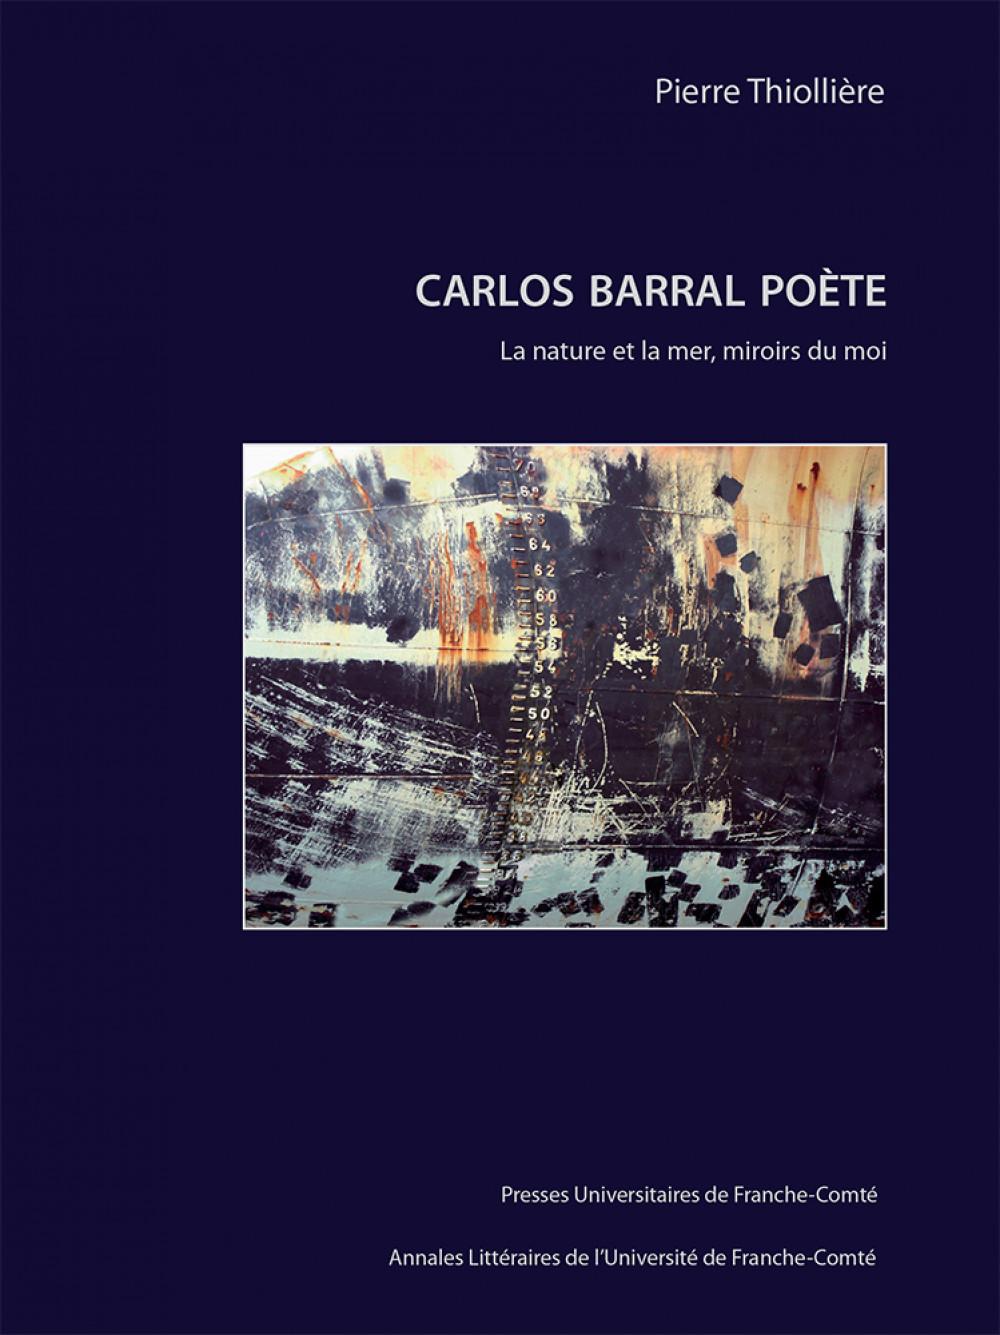 Carlos Barral poète